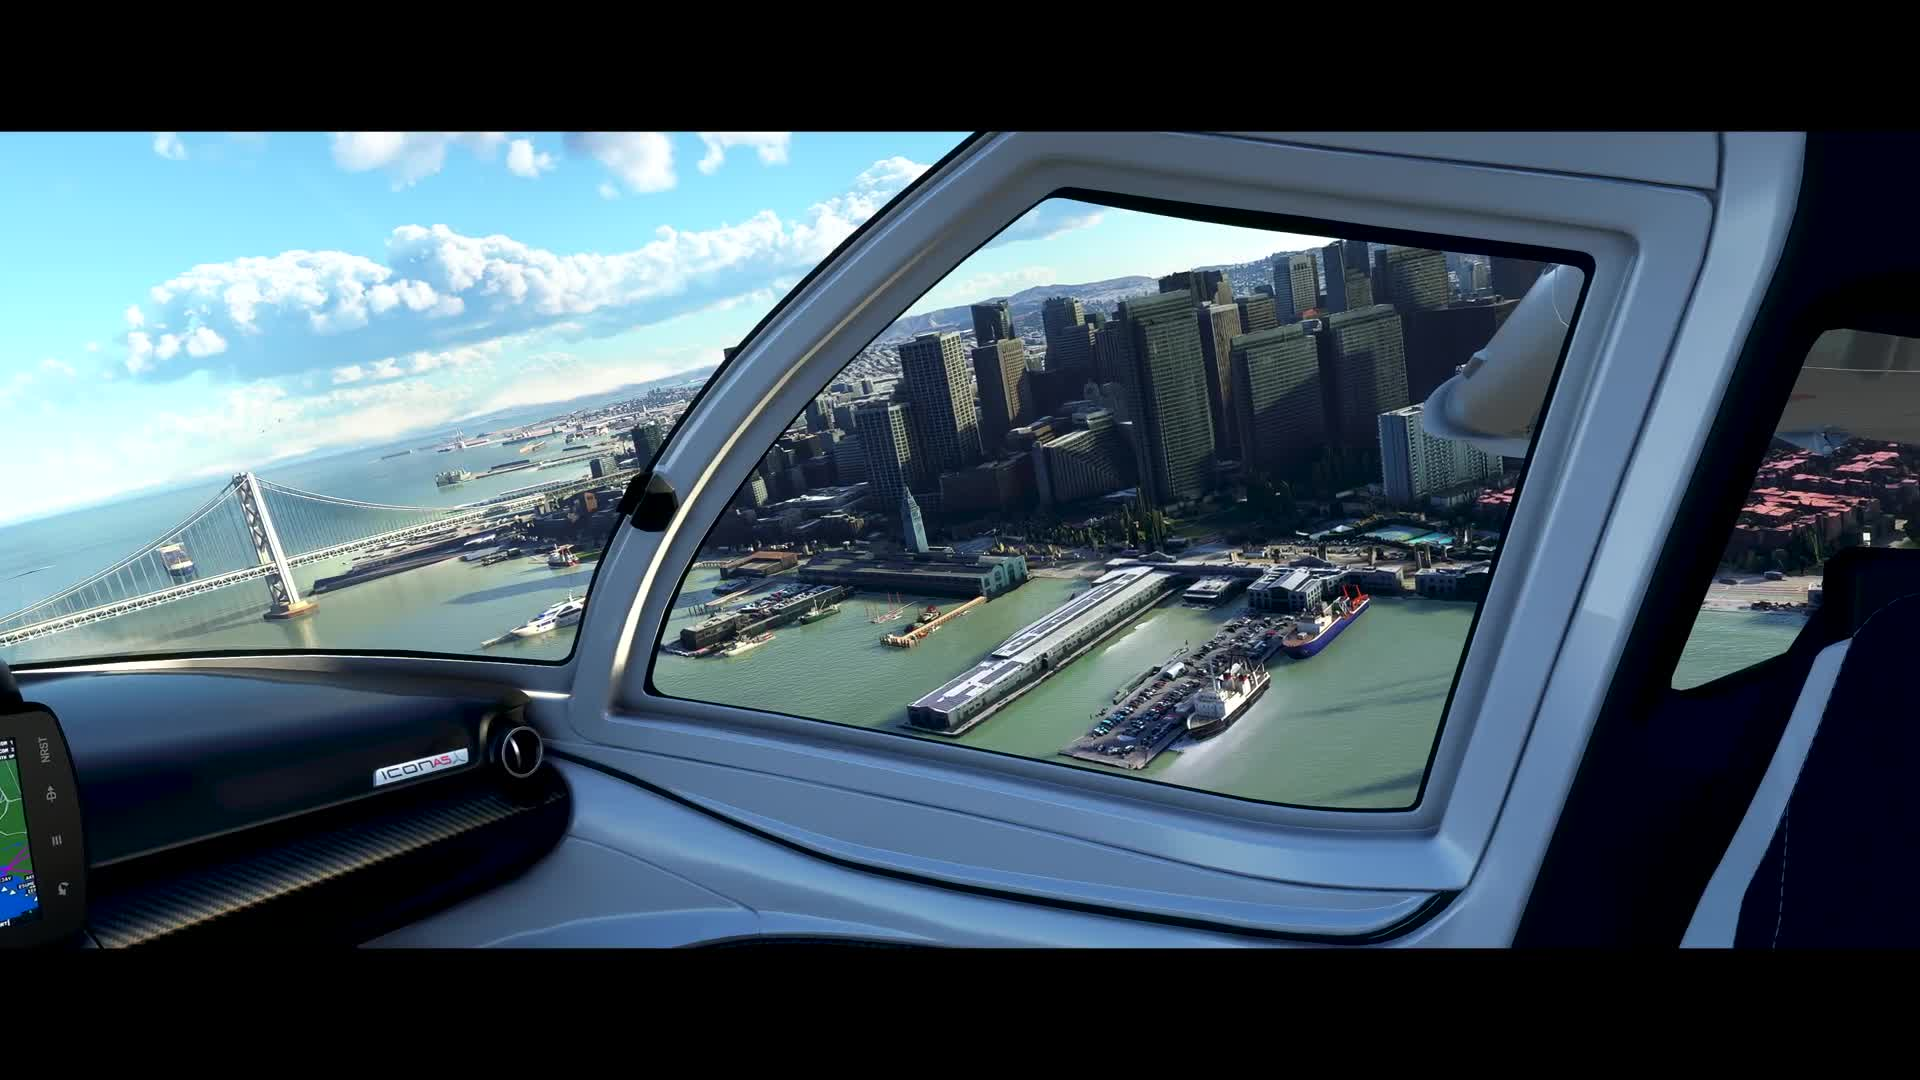 Microsoft, Trailer, Xbox, E3, Simulation, flugsimulation, Flight Simulator, Flugsimulator, Microsoft Flight Simulator, E3 2019, Highlights